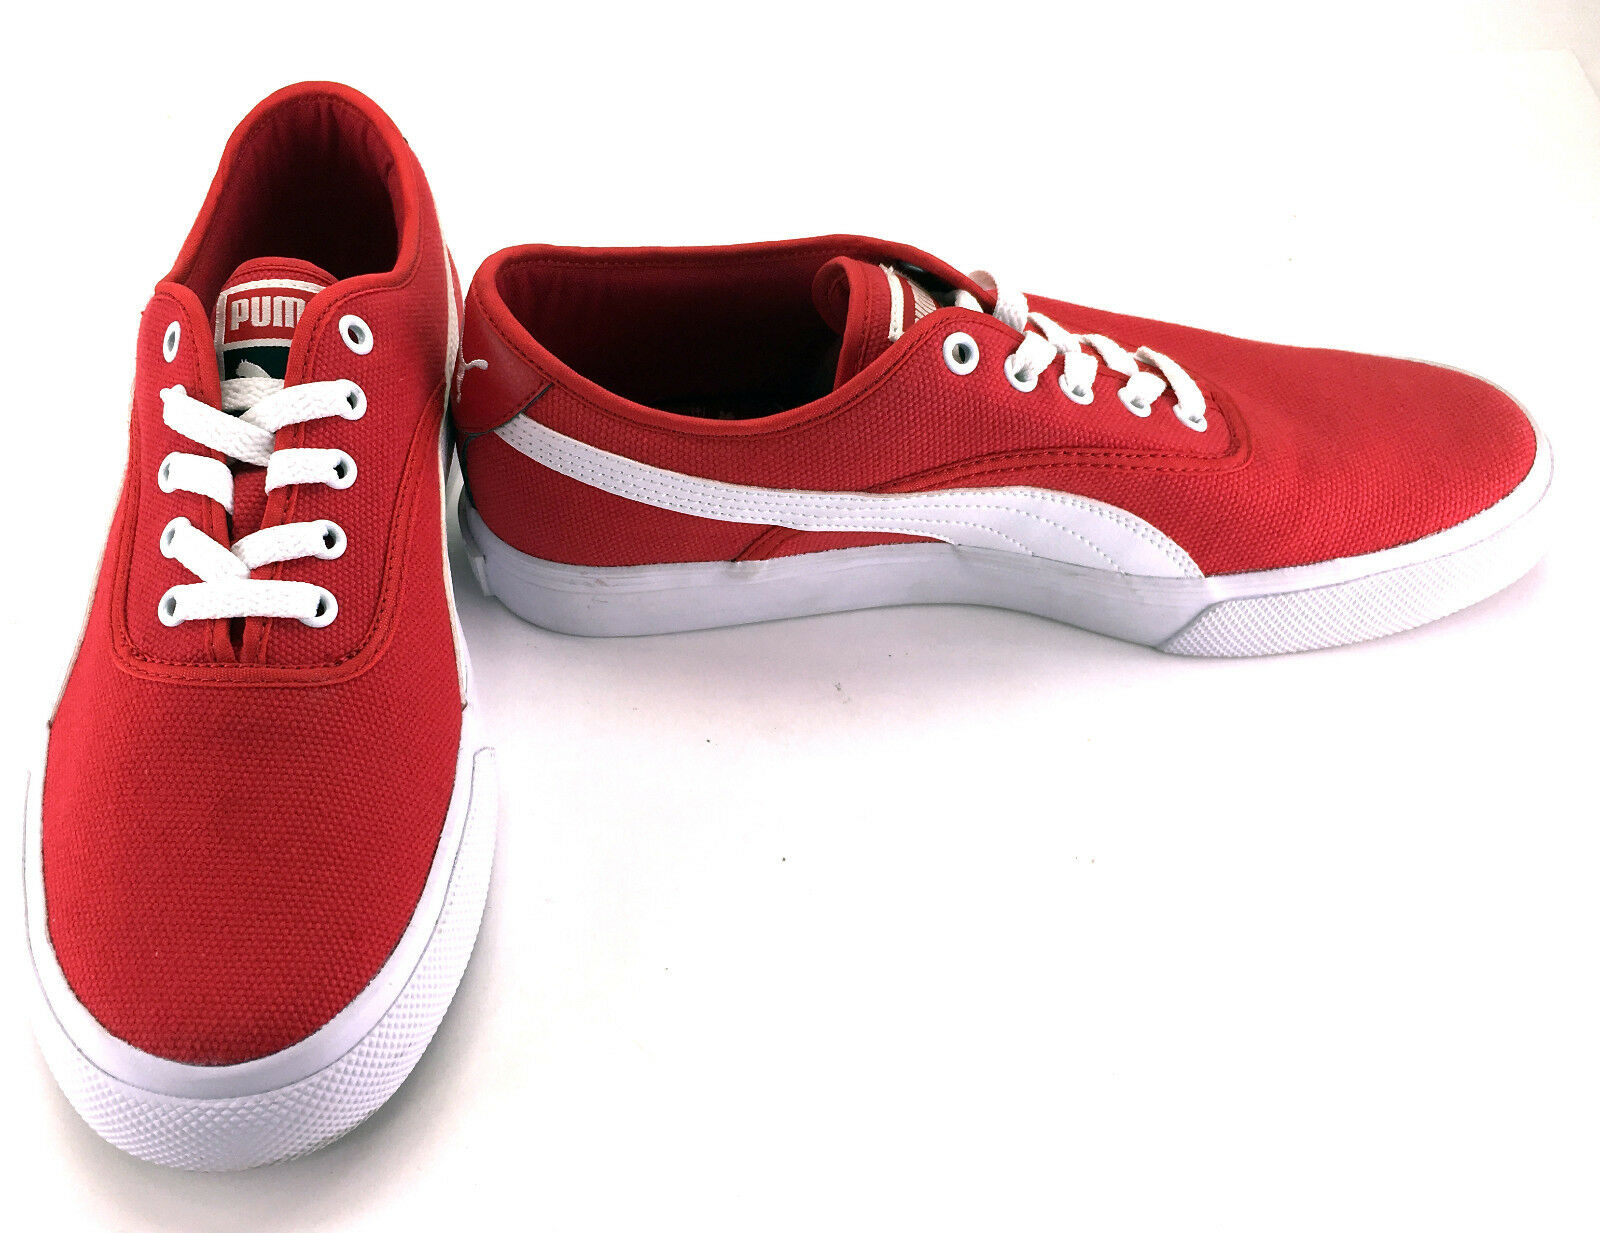 Puma Shoes El Loch Red/White  Size 7.5